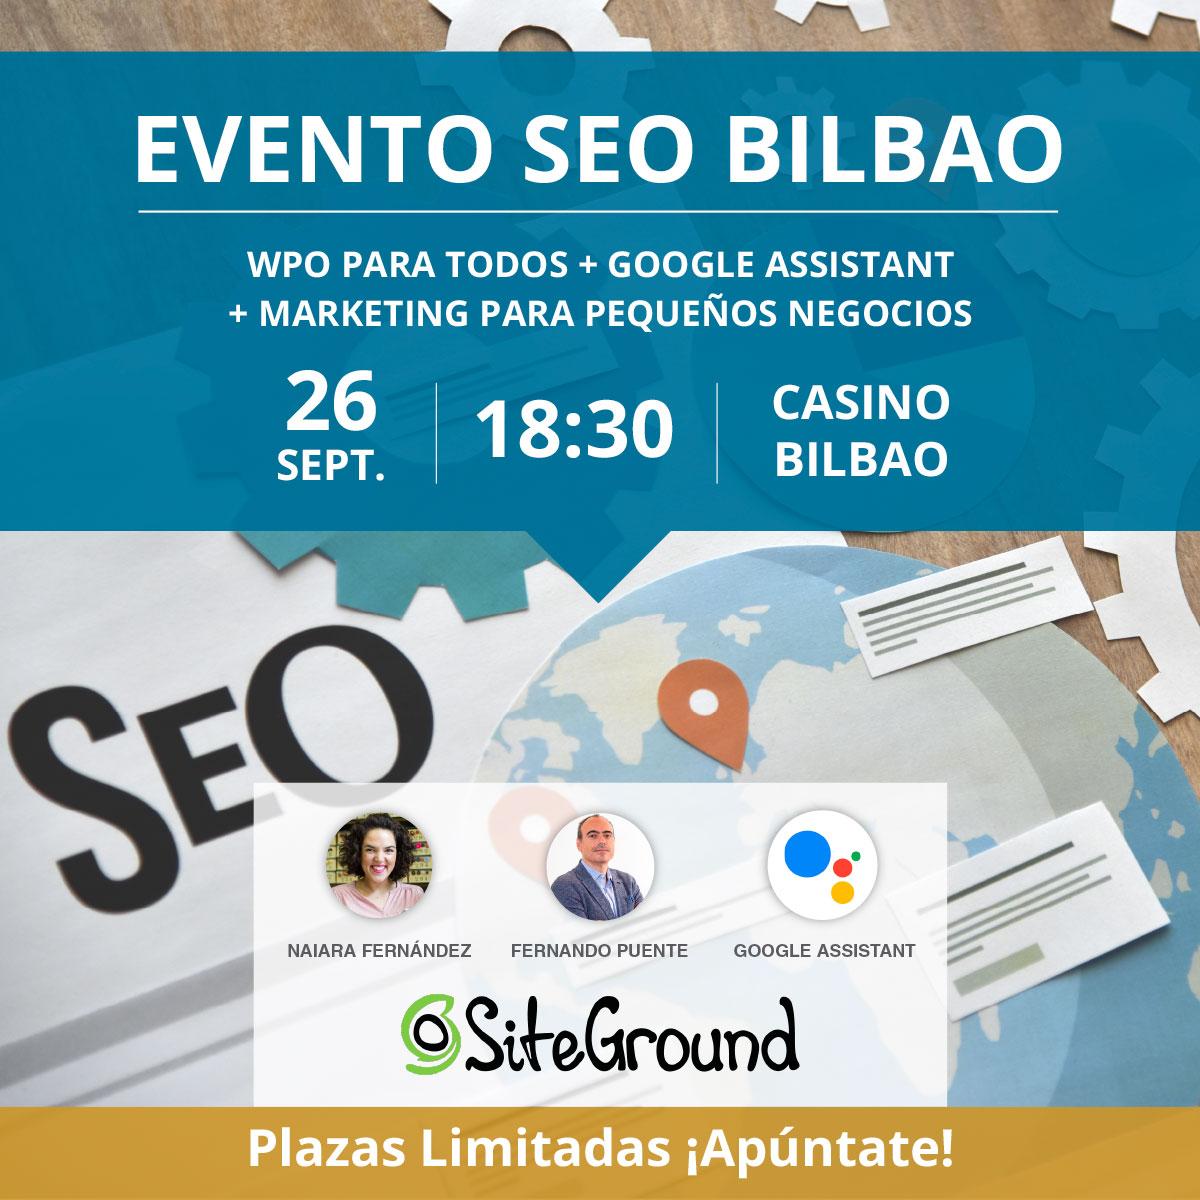 Evento SEO Bilbao septiembre 2019